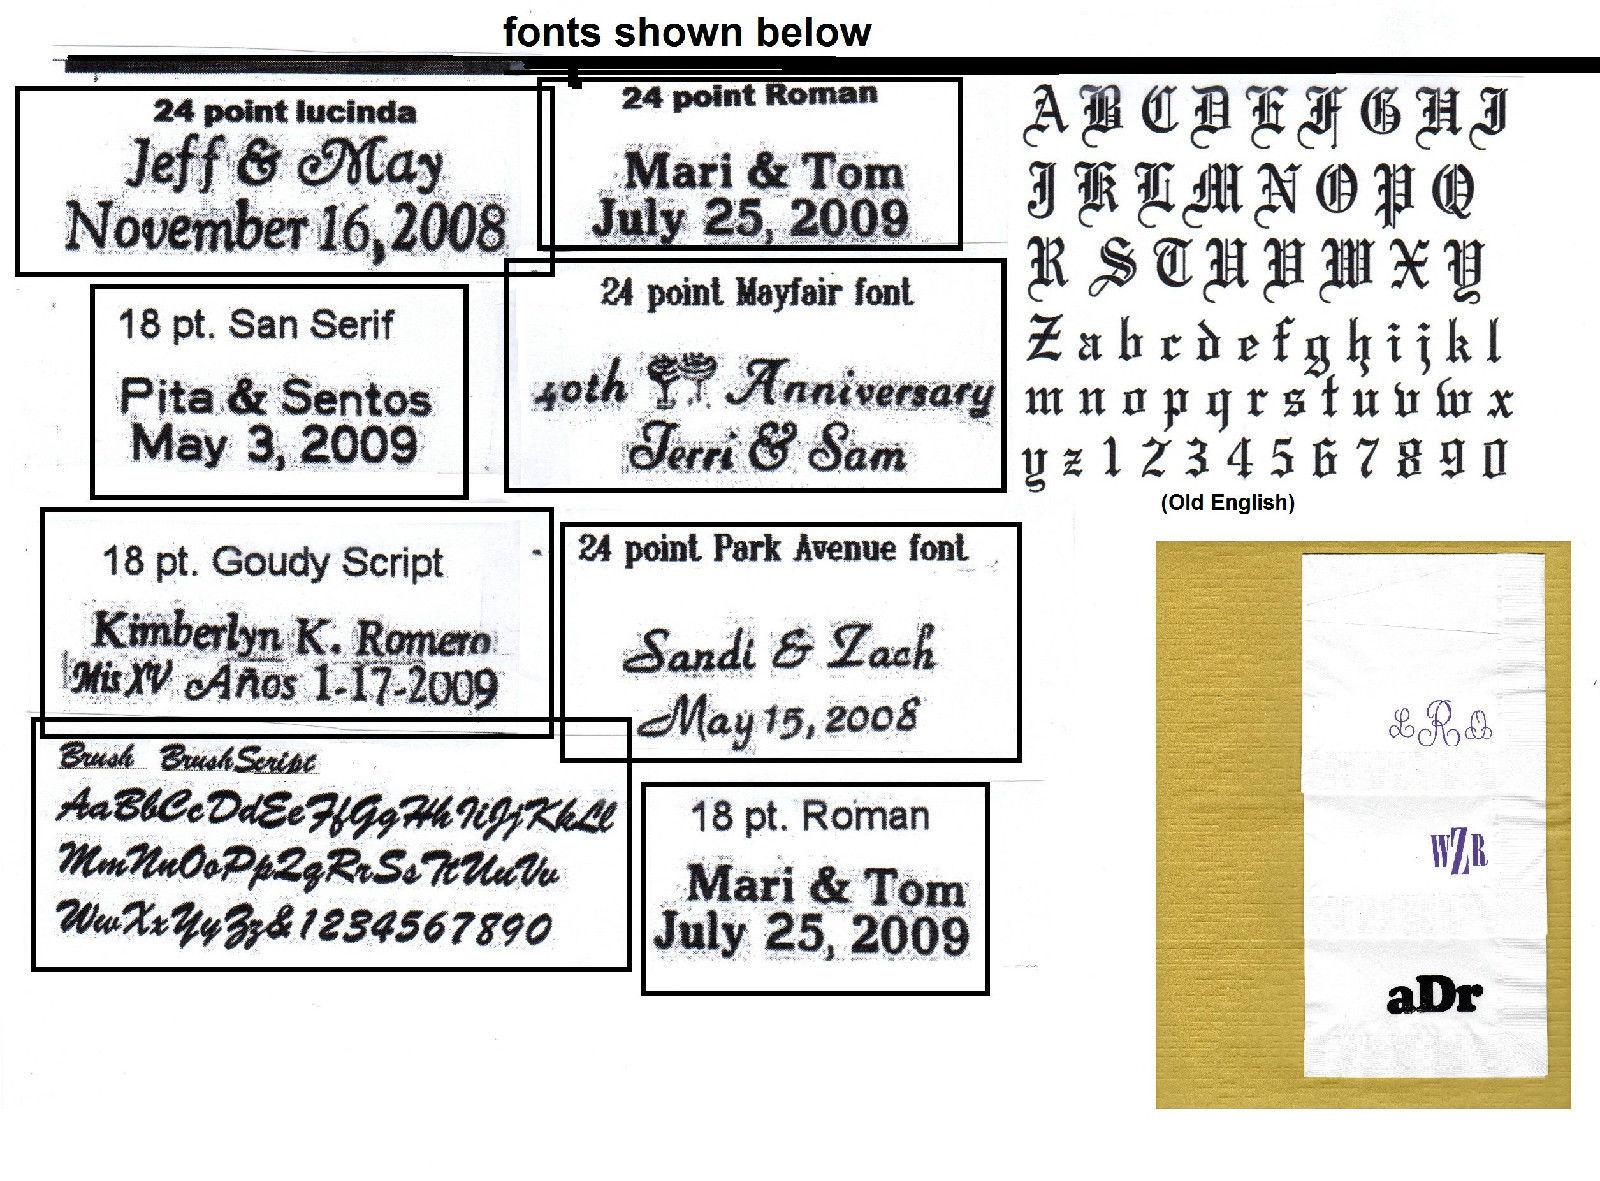 ROYAL FLUSH CARD LOGO 50 Personalized printed cocktail beverage napkins wedding